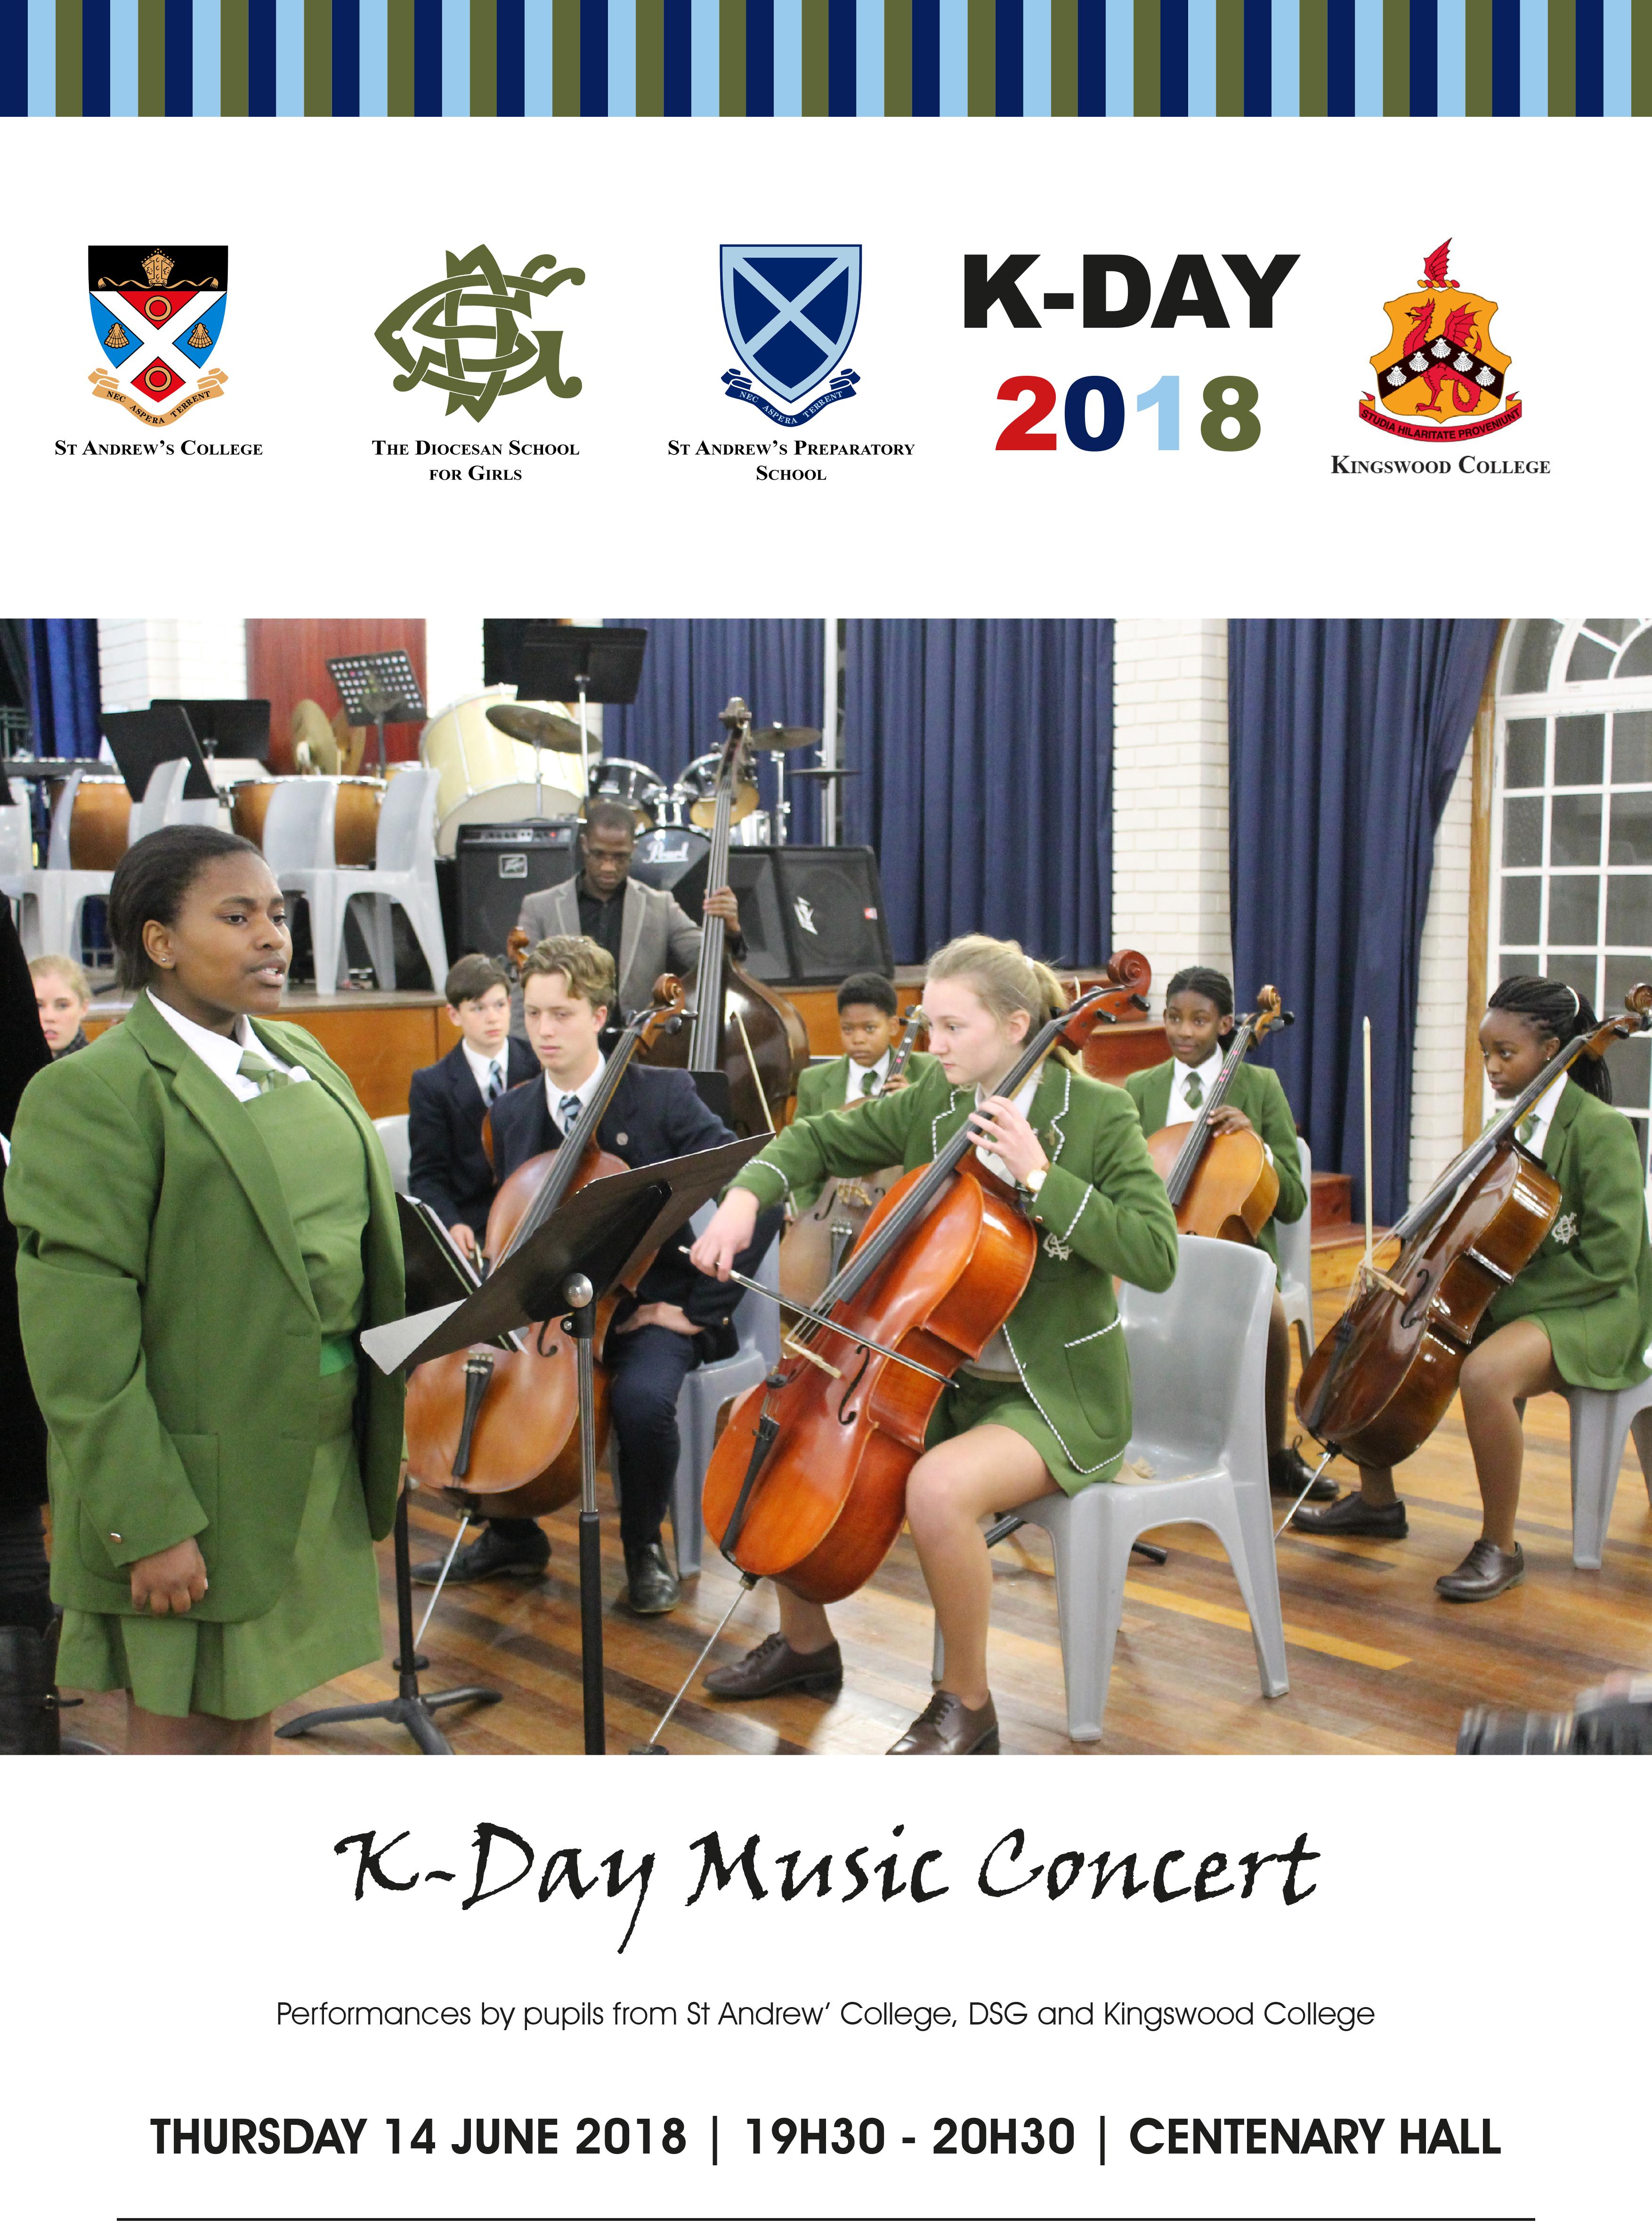 K-Day 2018 Music Concert Poster